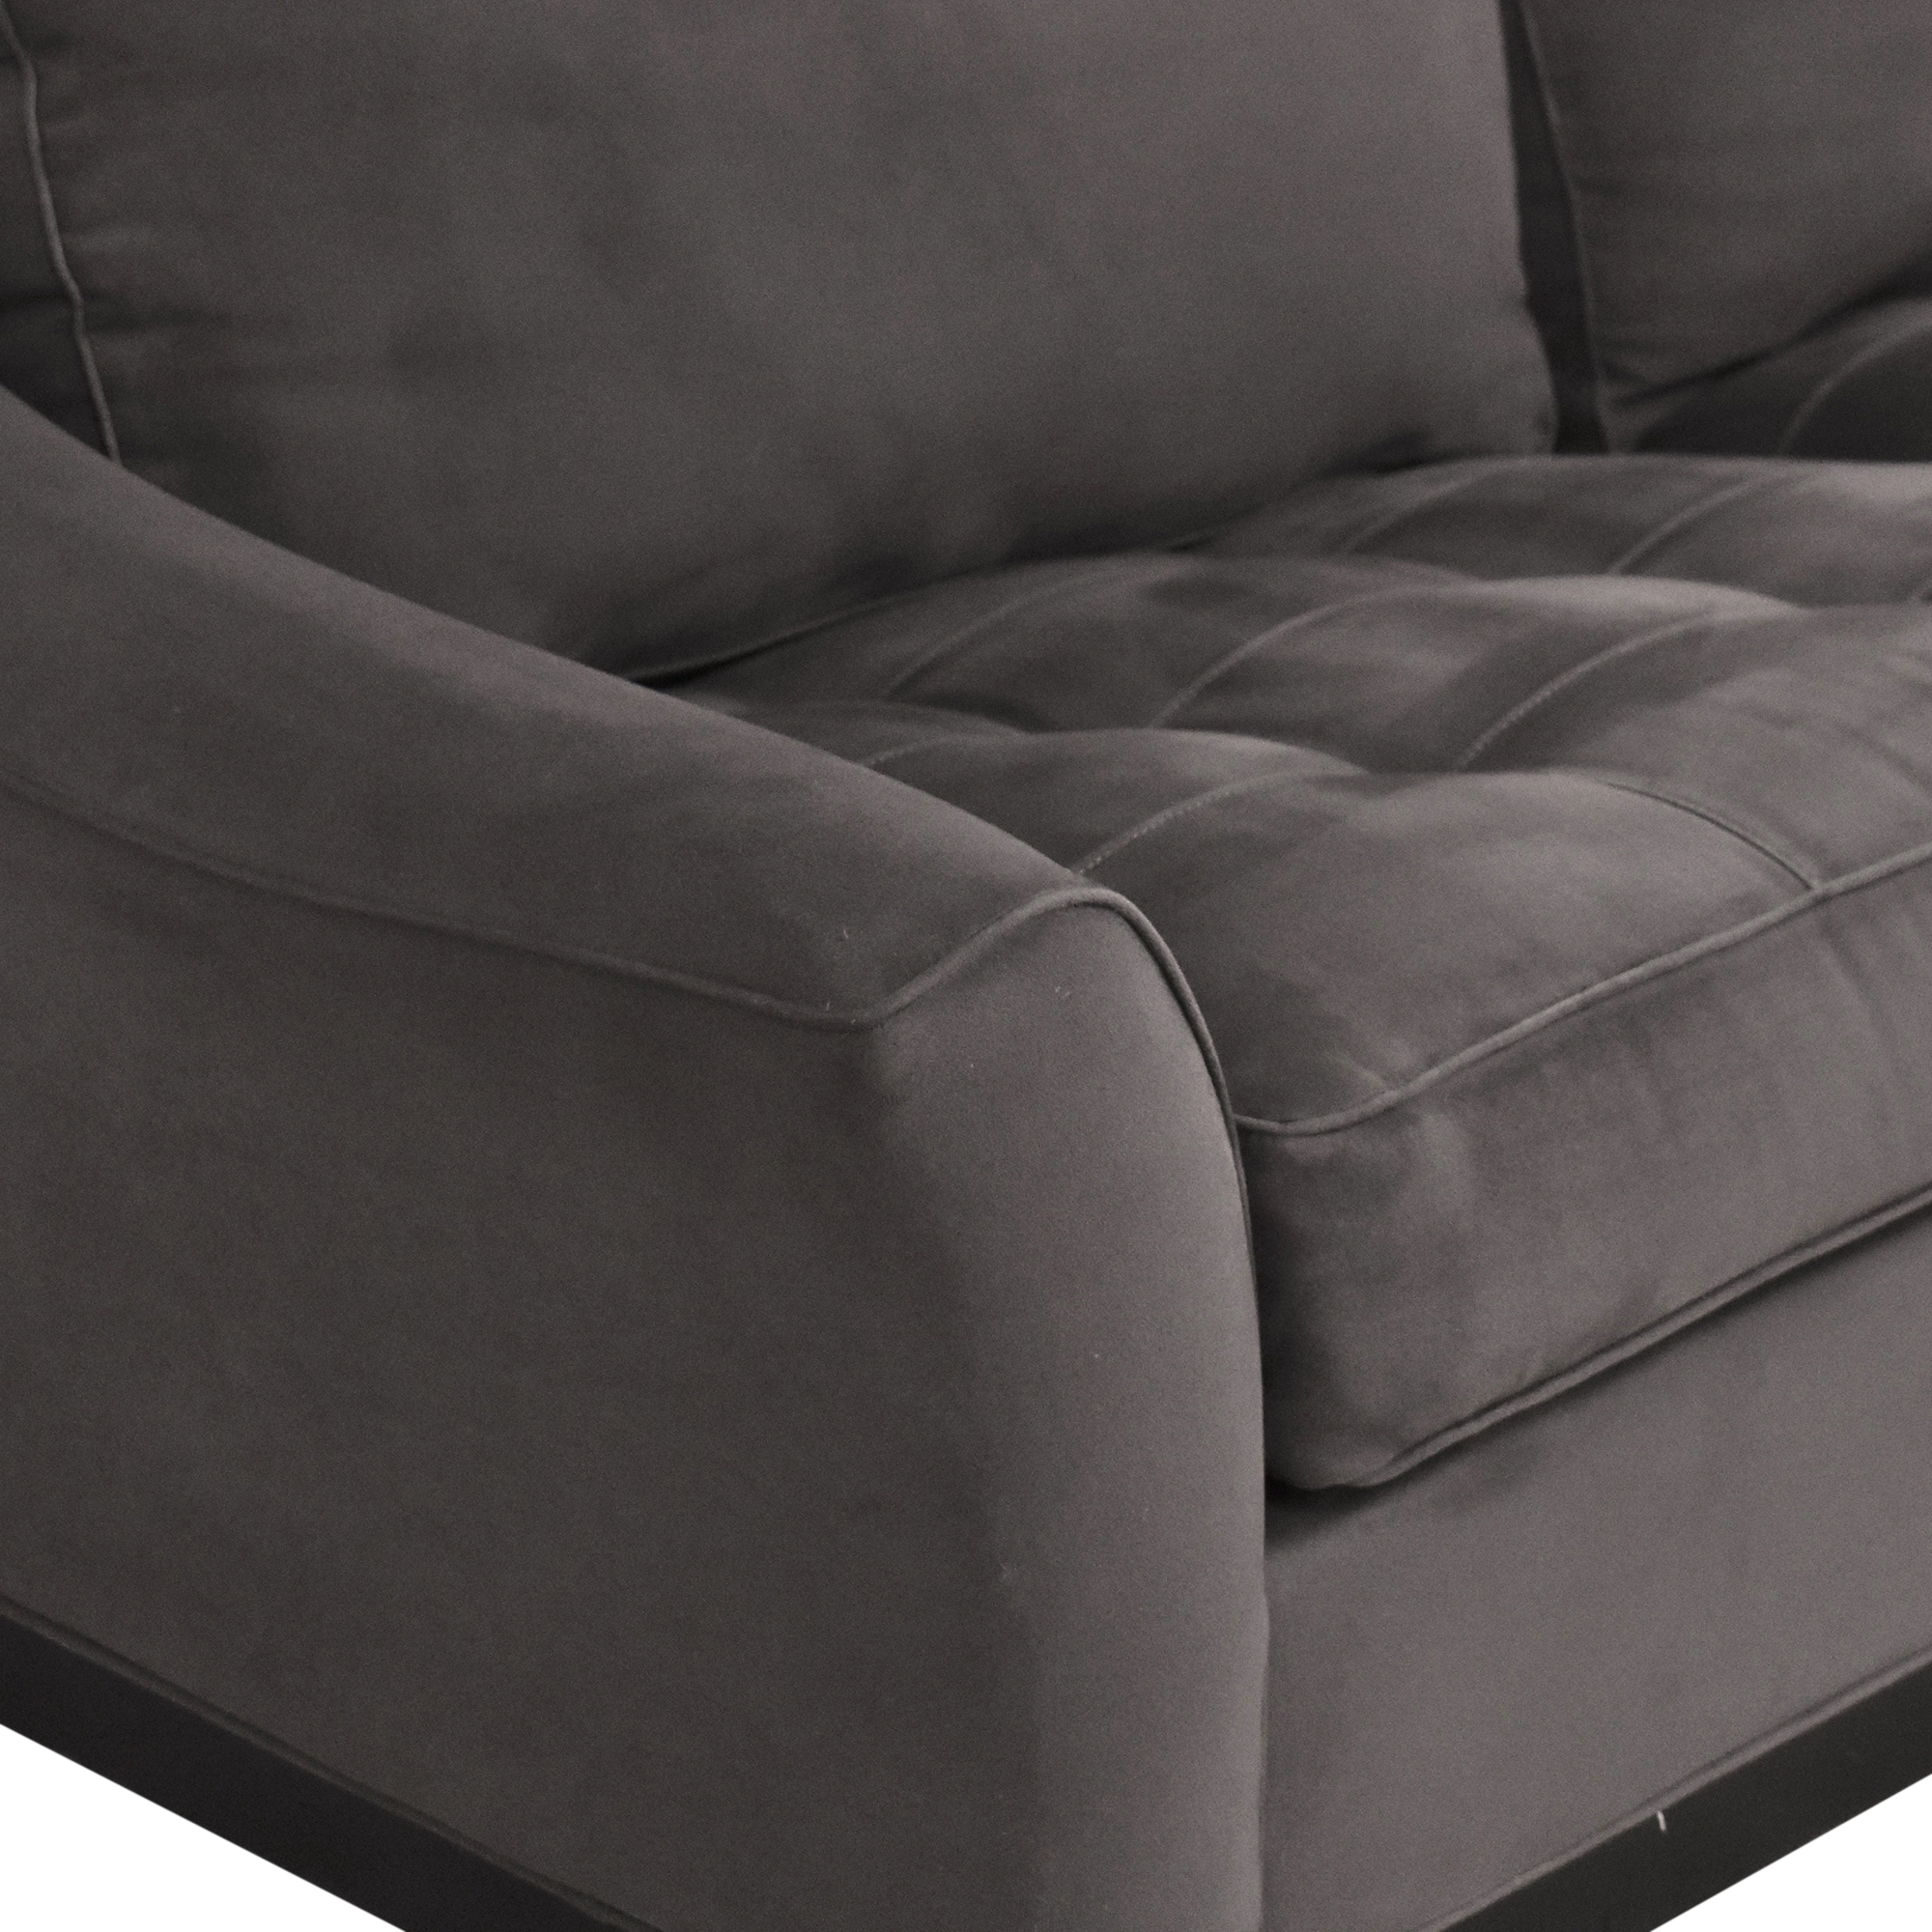 buy Raymour & Flanigan Raymour & Flanigan Rory Sleeper Sofa online